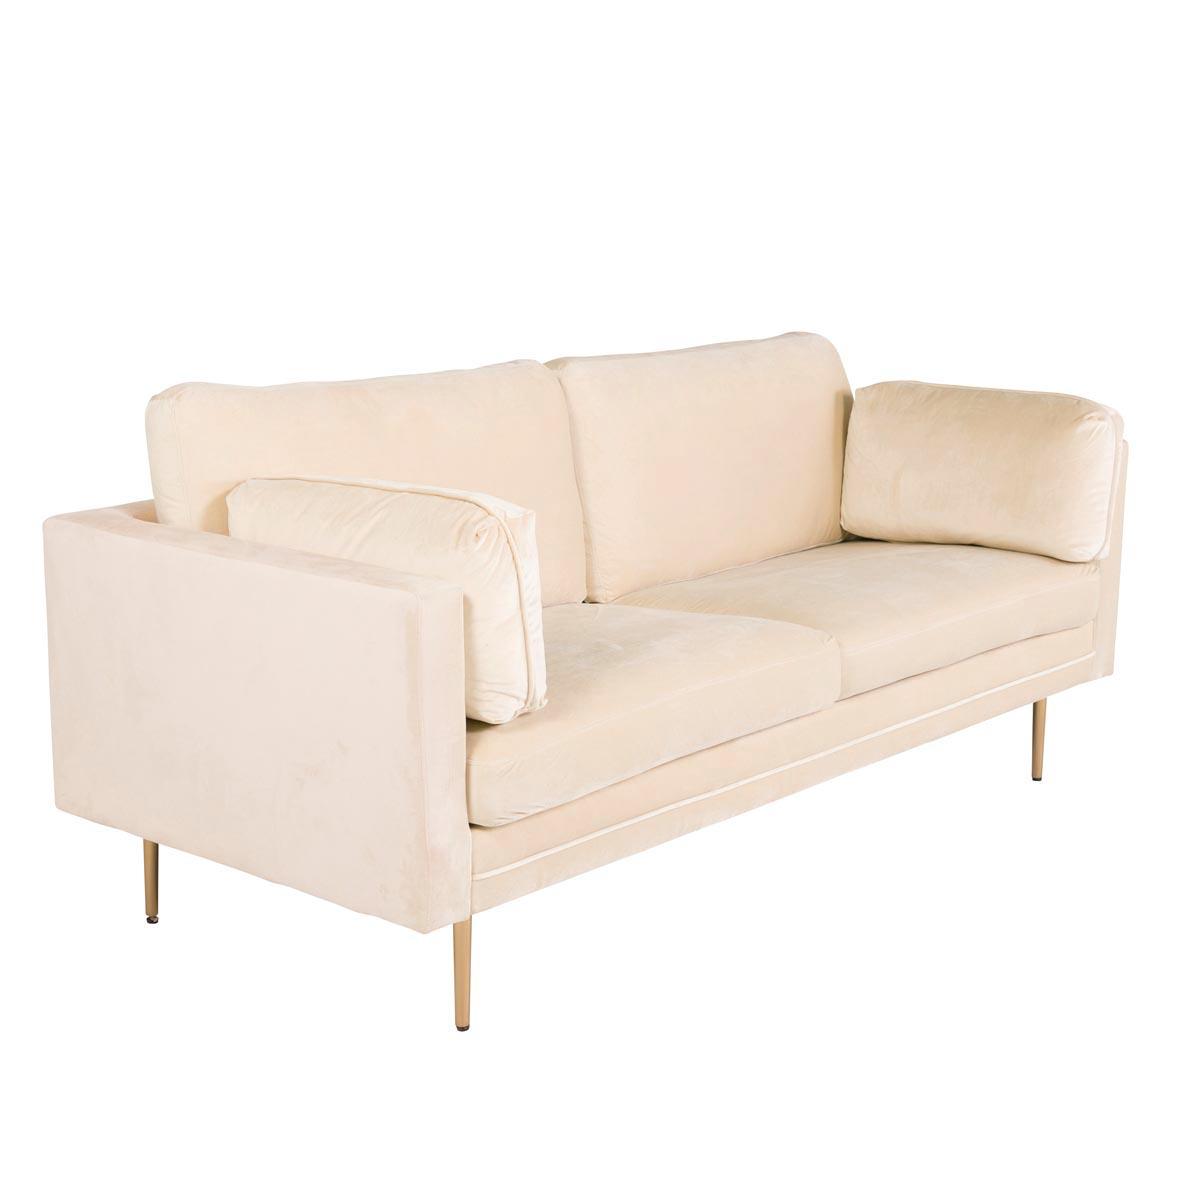 Boom-3-sits-soffa-offwhite-sammet-vinkel-18045-980